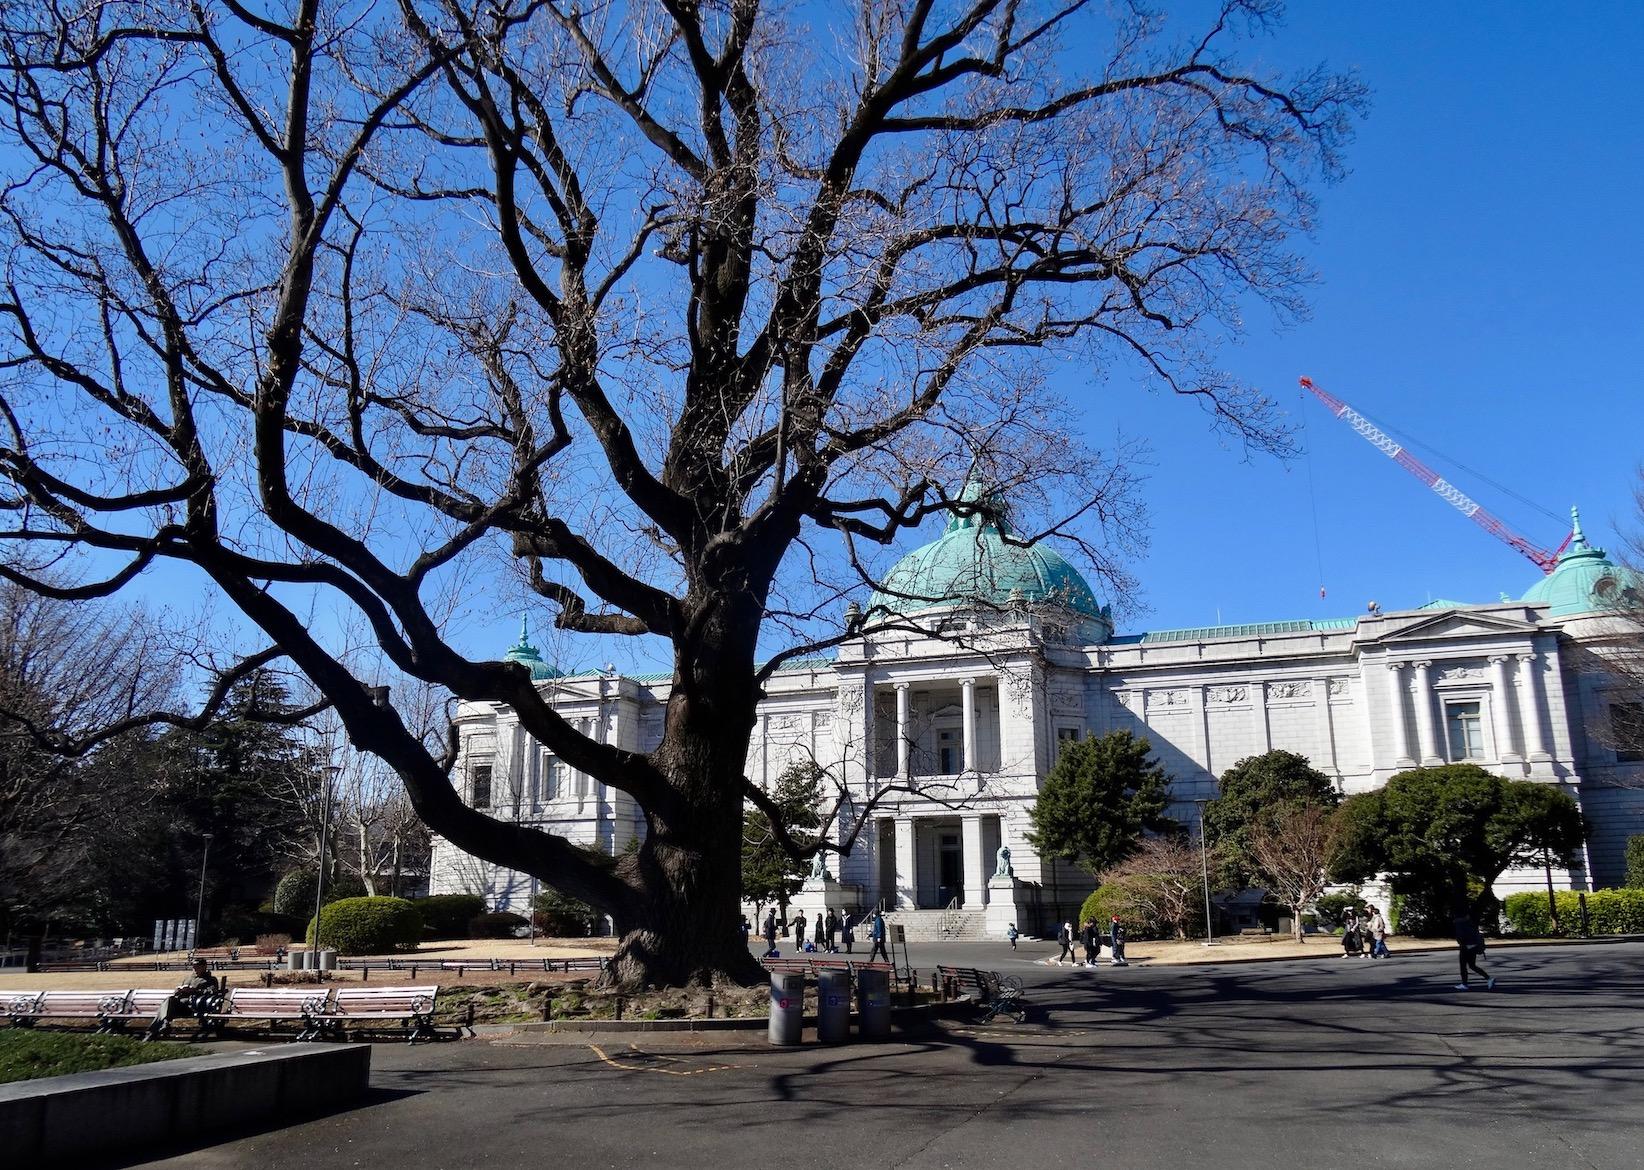 Hyokeikan Tokyo National Museum